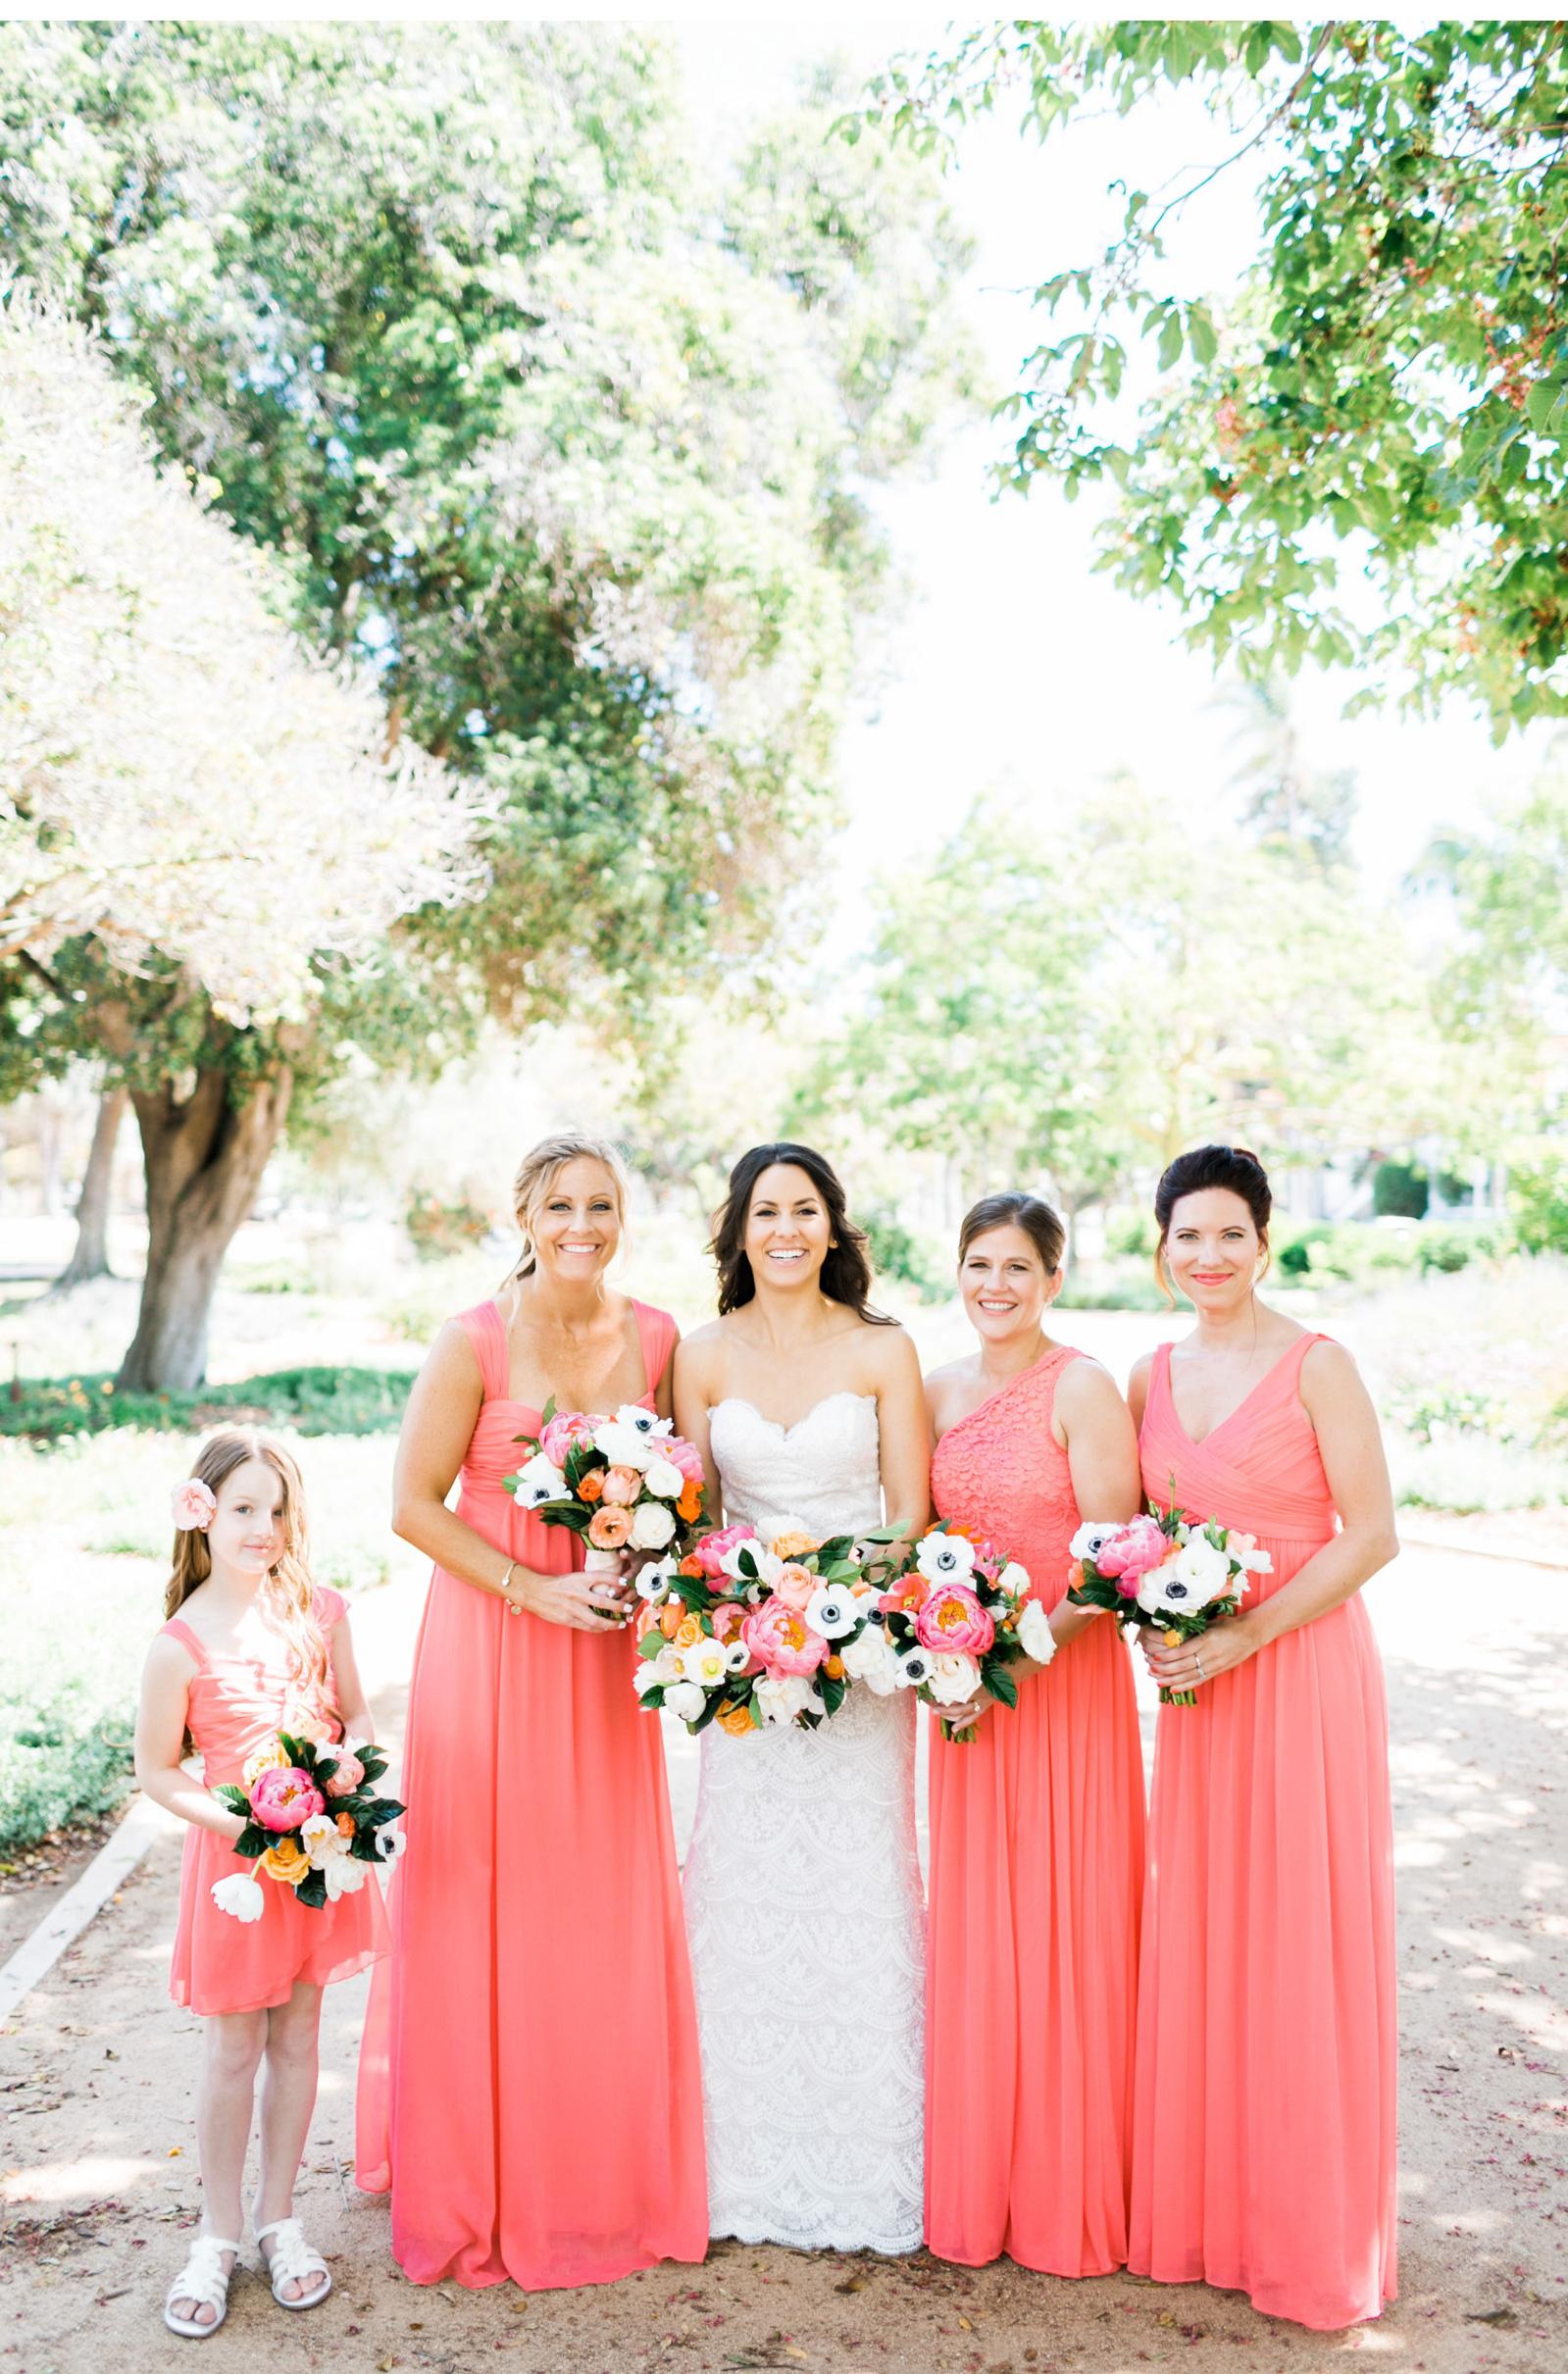 Santa-Barbara-Wedding-Natalie-Schutt-Photography_04.jpg